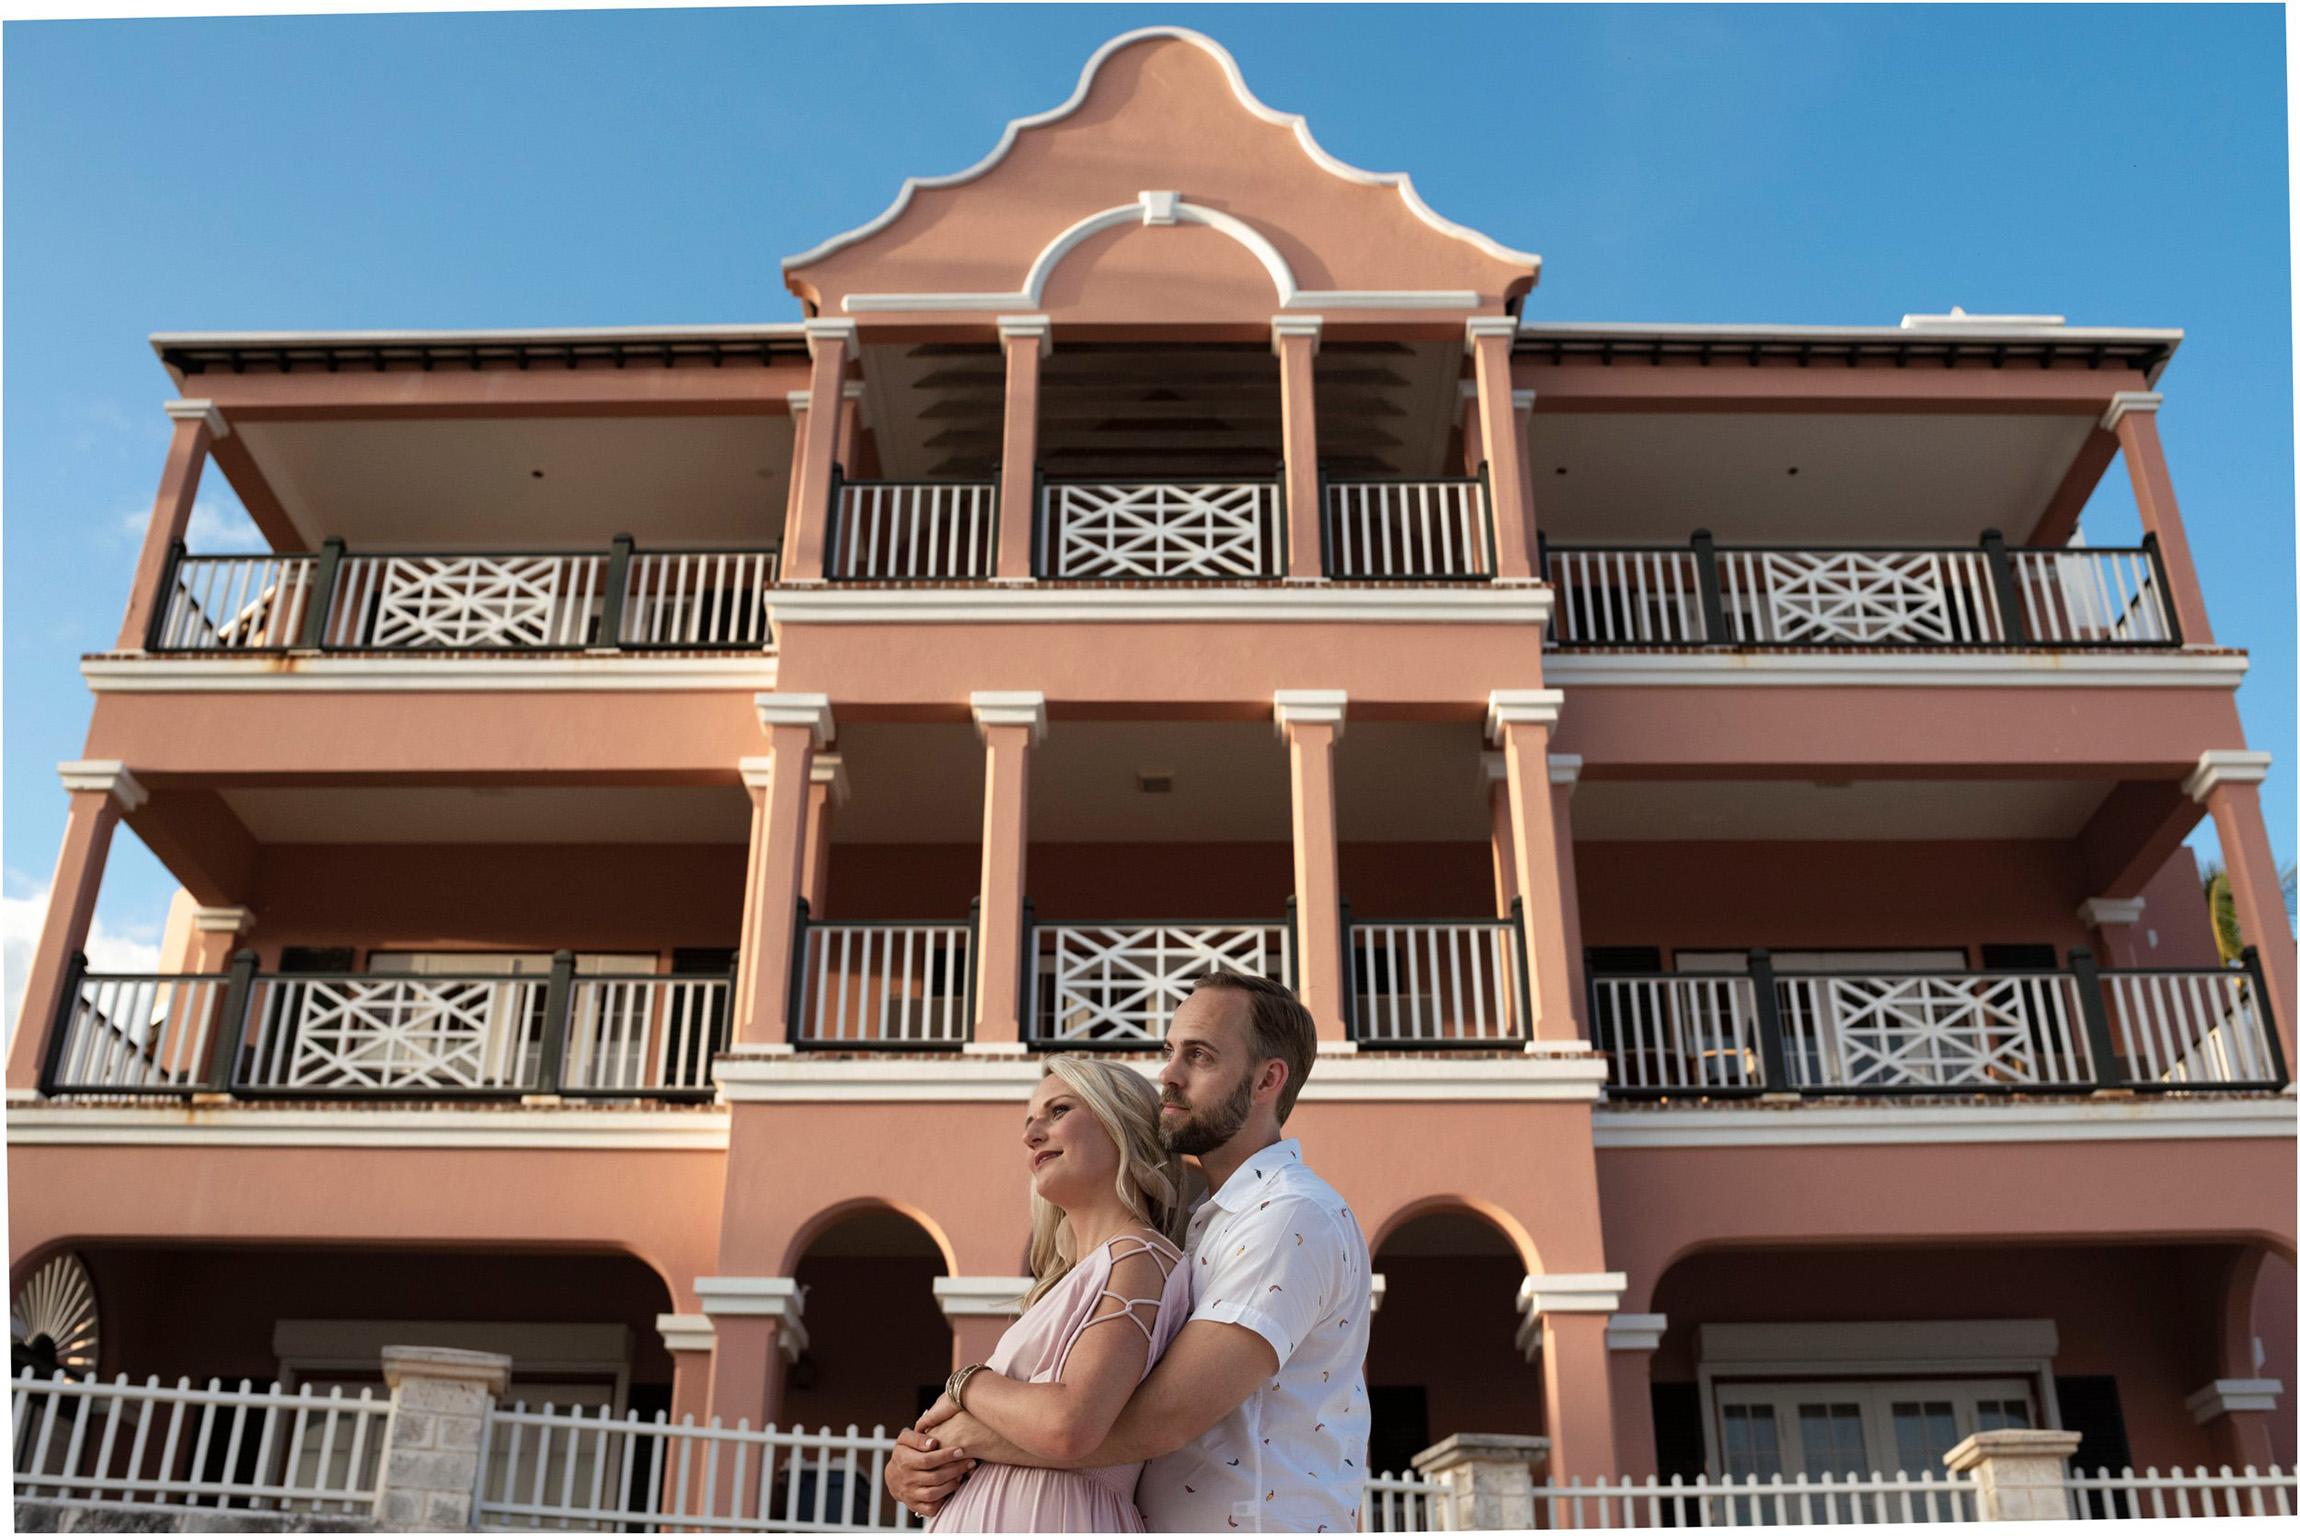 ©FianderFoto_Bermuda_Tom Moore's Jungle_Proposal Maternity Photographer_Erika_Andy_023.jpg